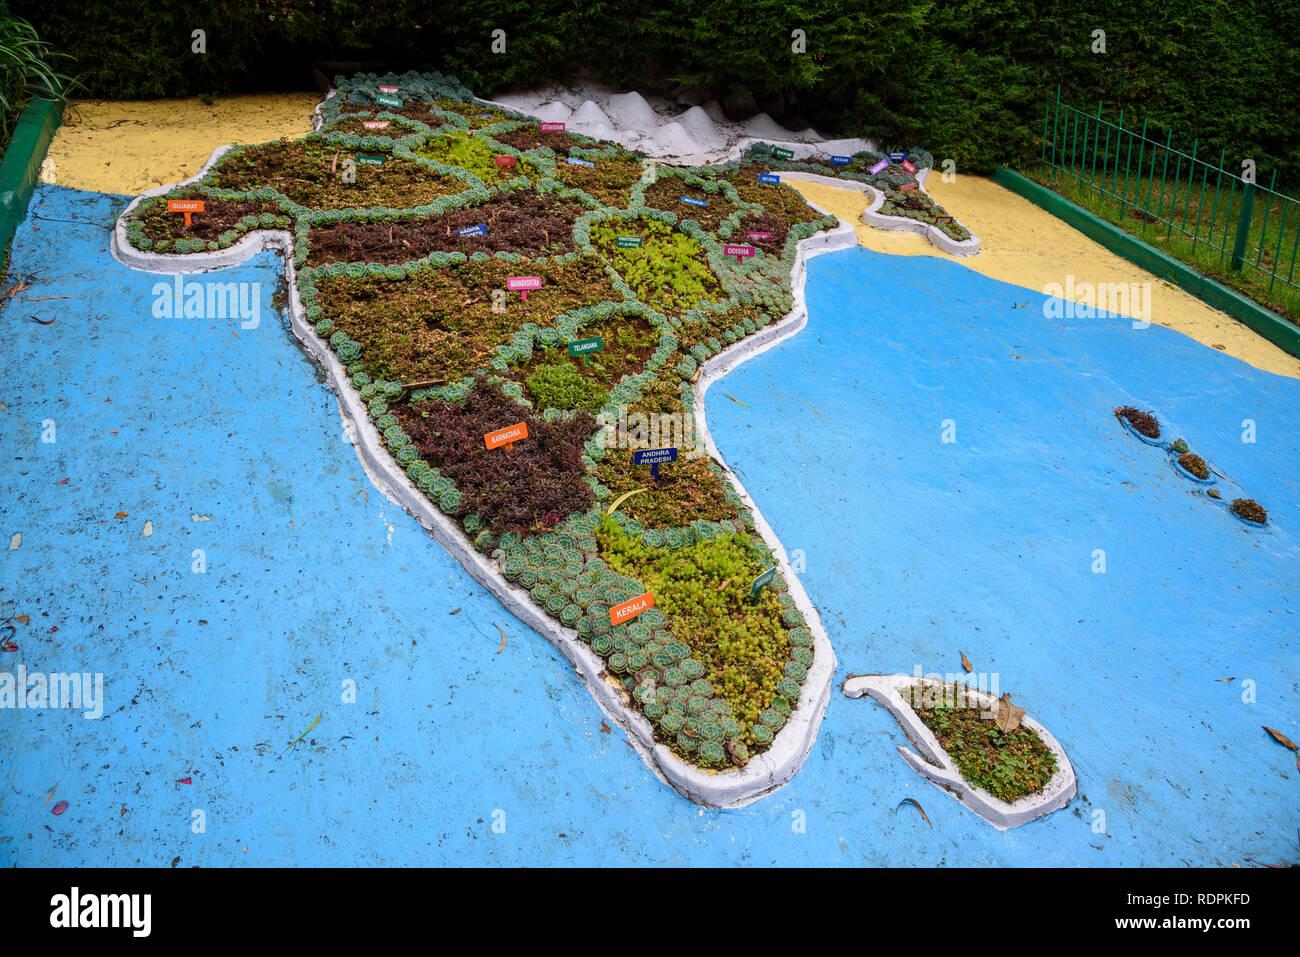 Botanische Gärten, Ooty, Nilgiri Hills, Tamil Nadu, Indien Stockbild